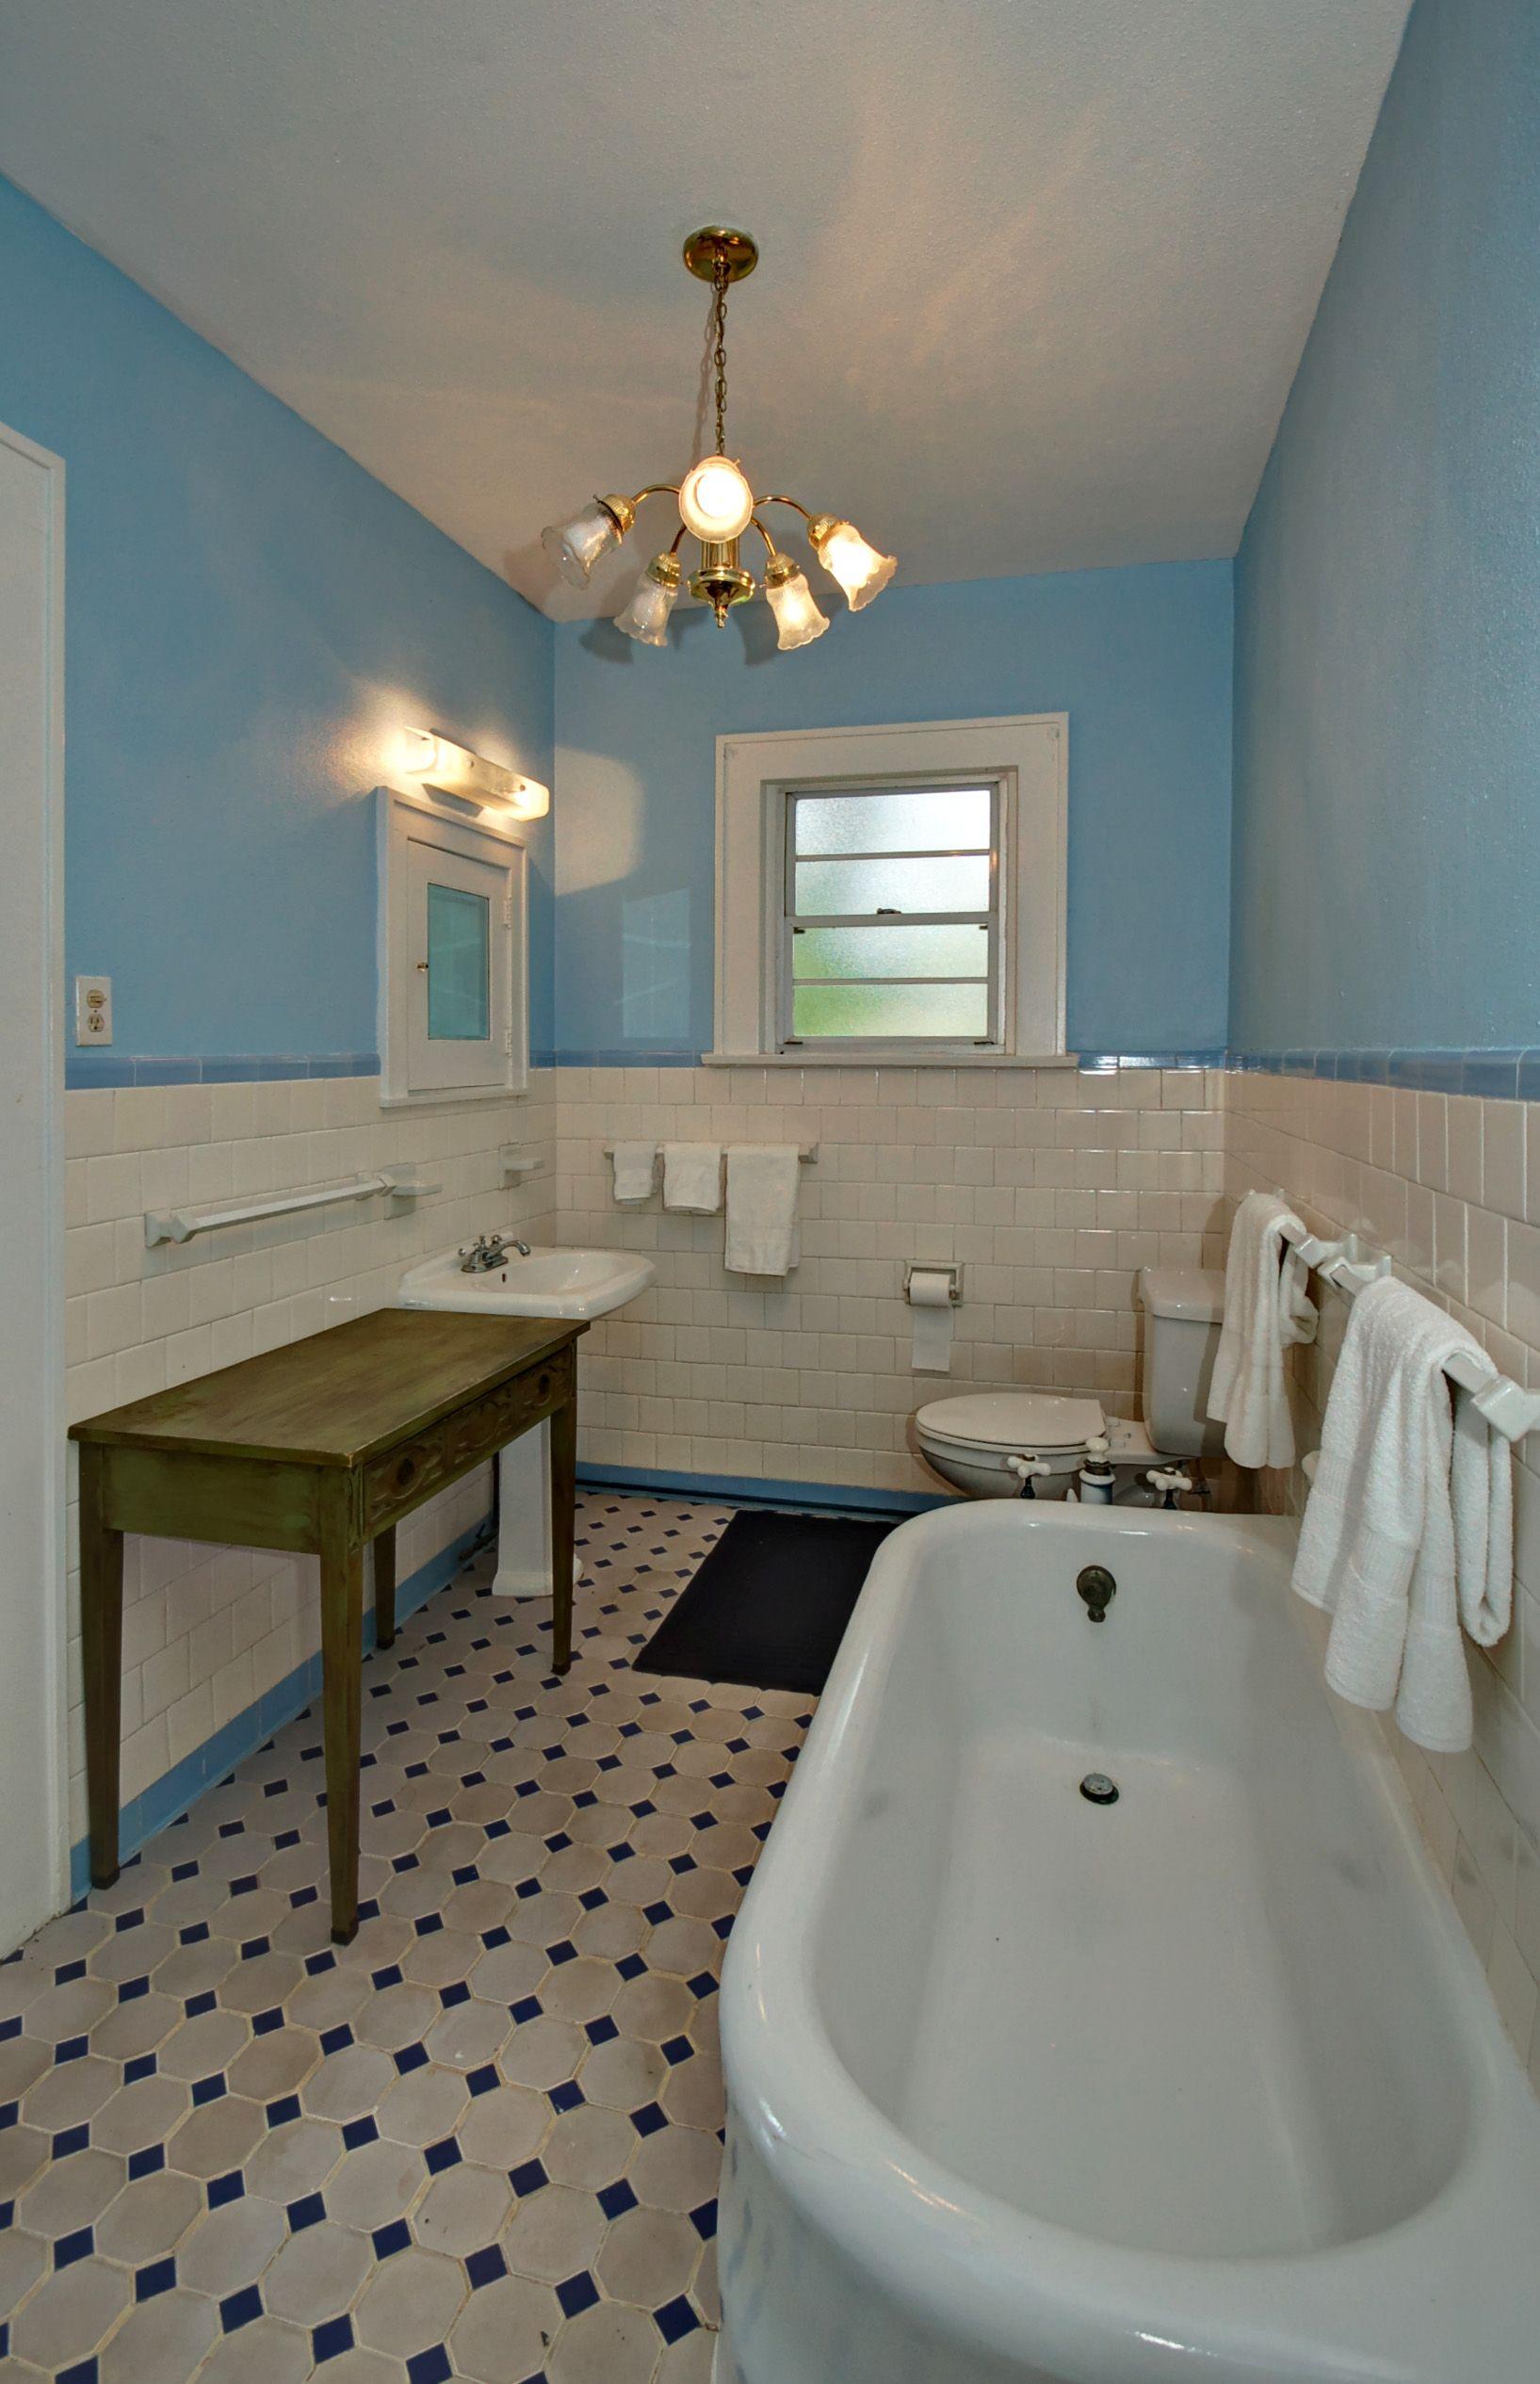 Early 1900 S Bathroom Small Space Bathroom Bathroom Design Layout Guest Bathroom Design